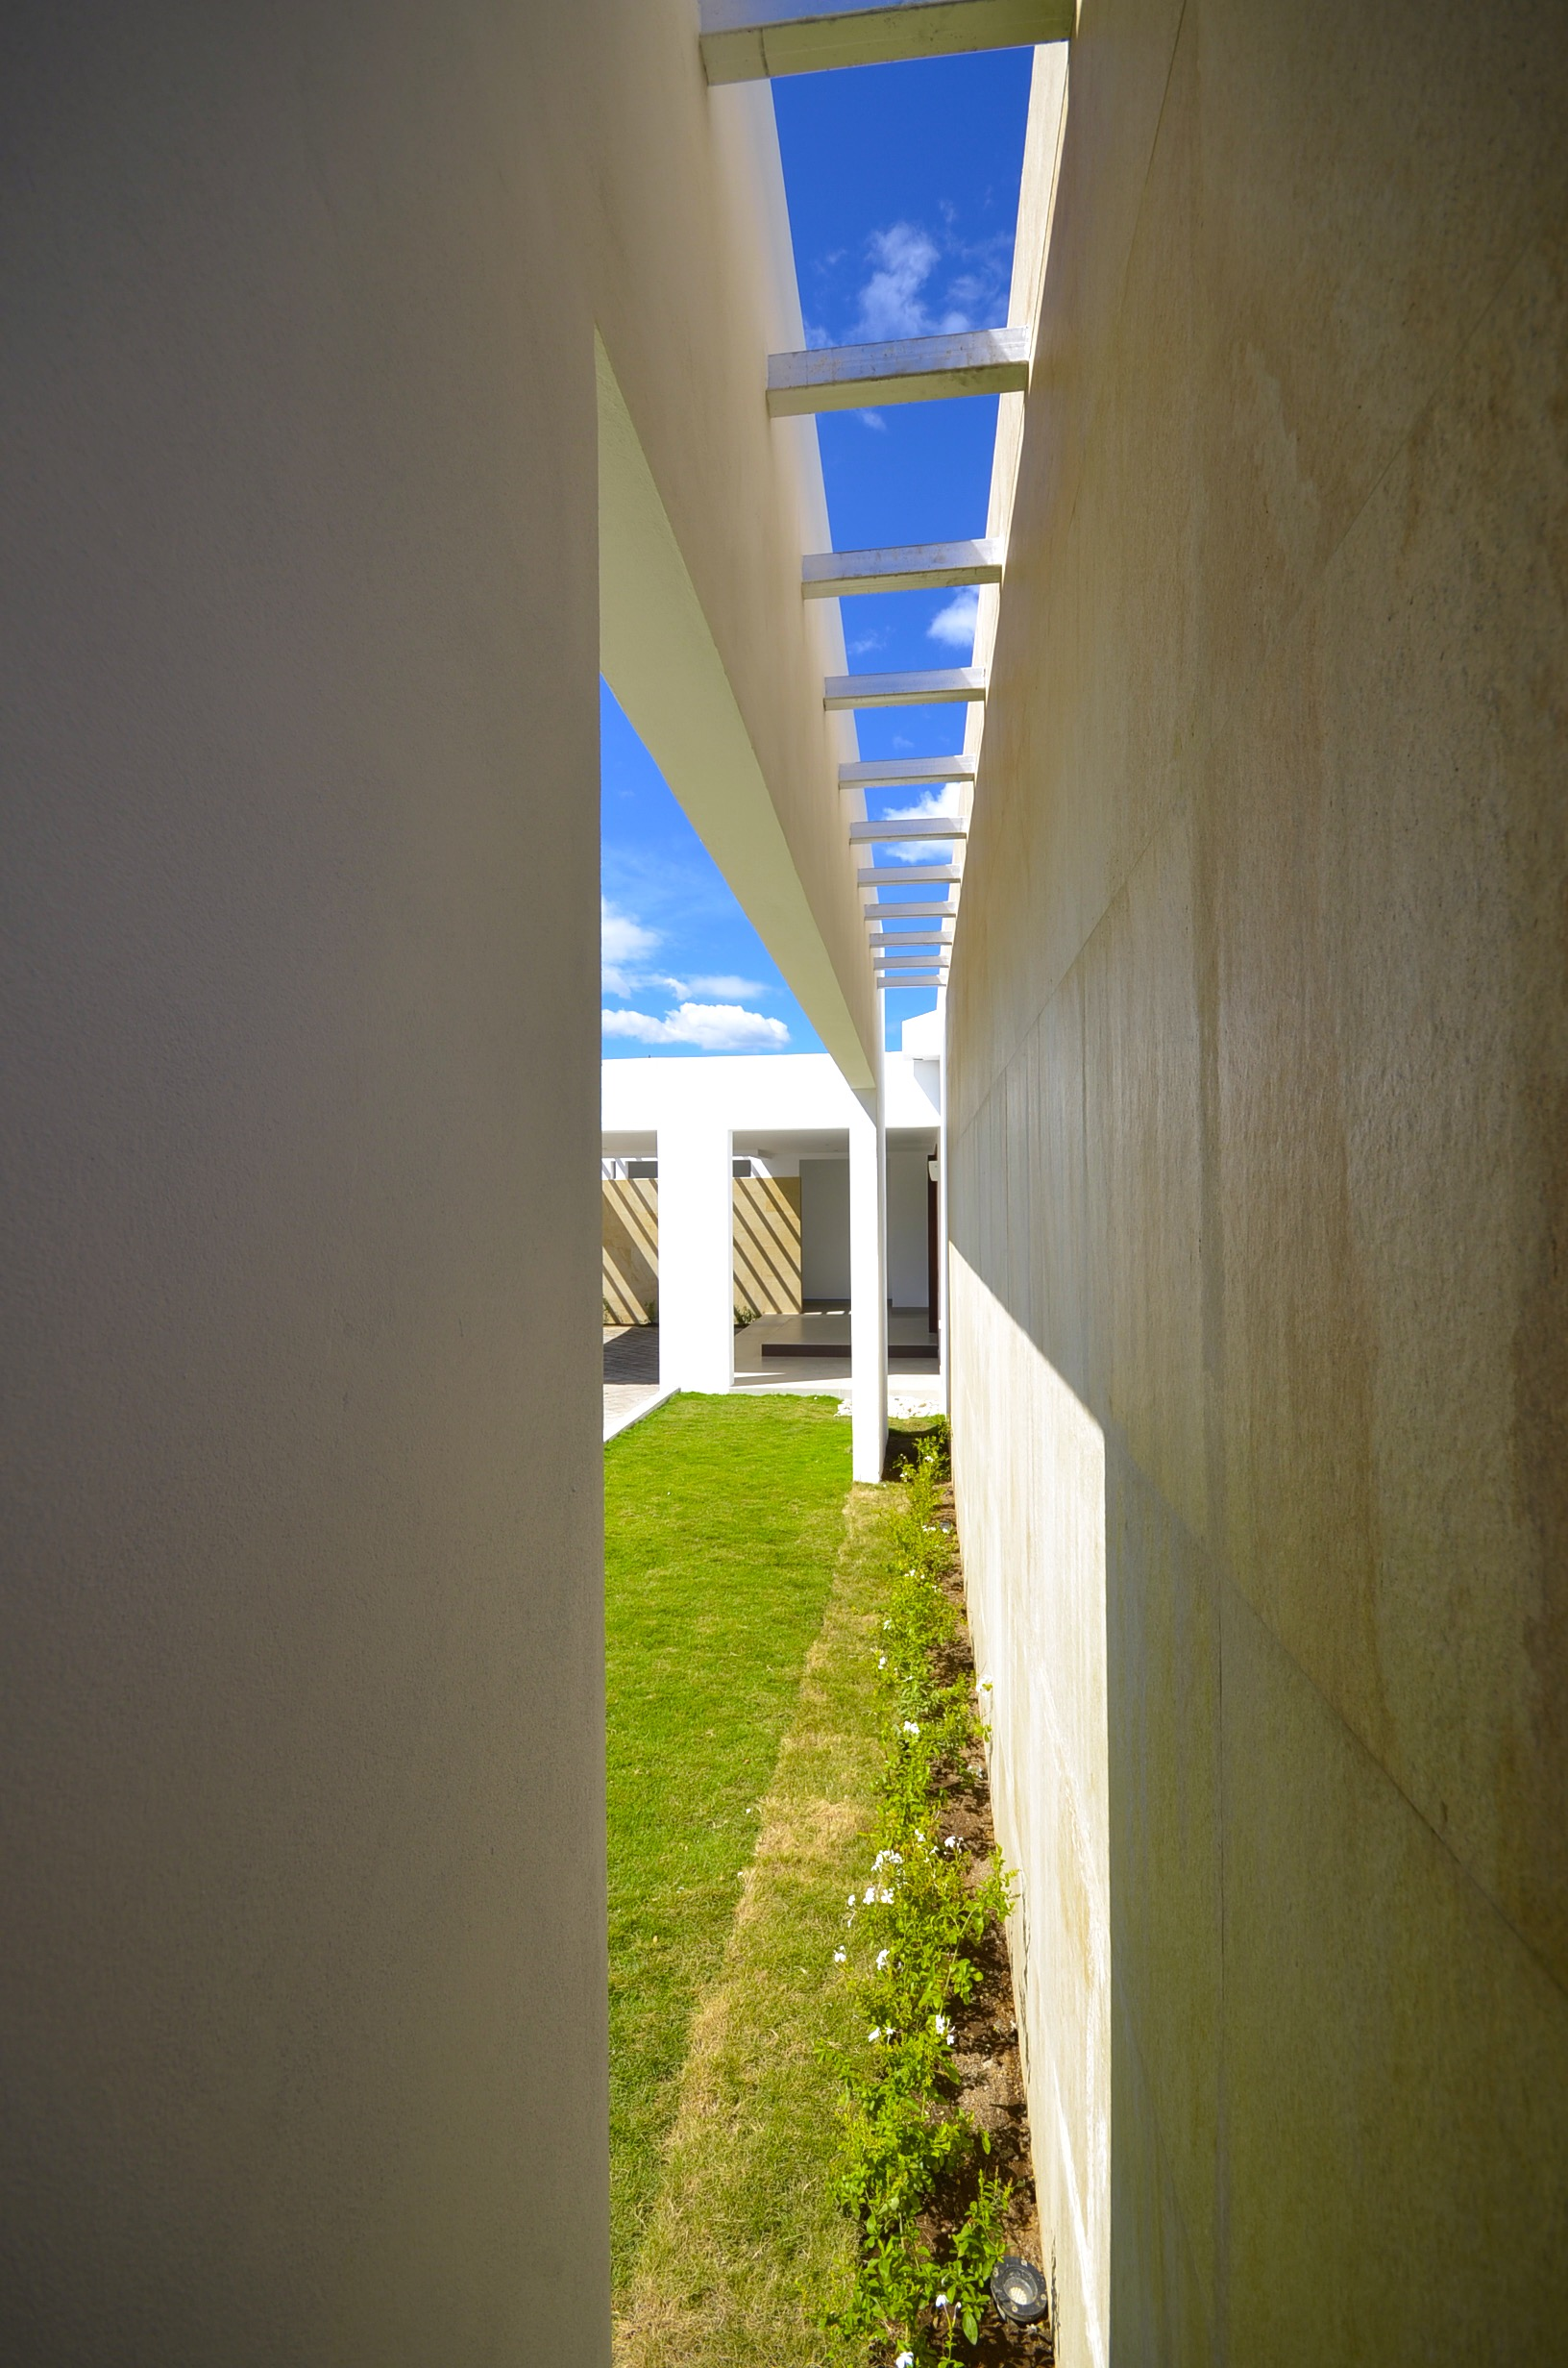 Roof grill, exterior design work, EL Mirador Residence